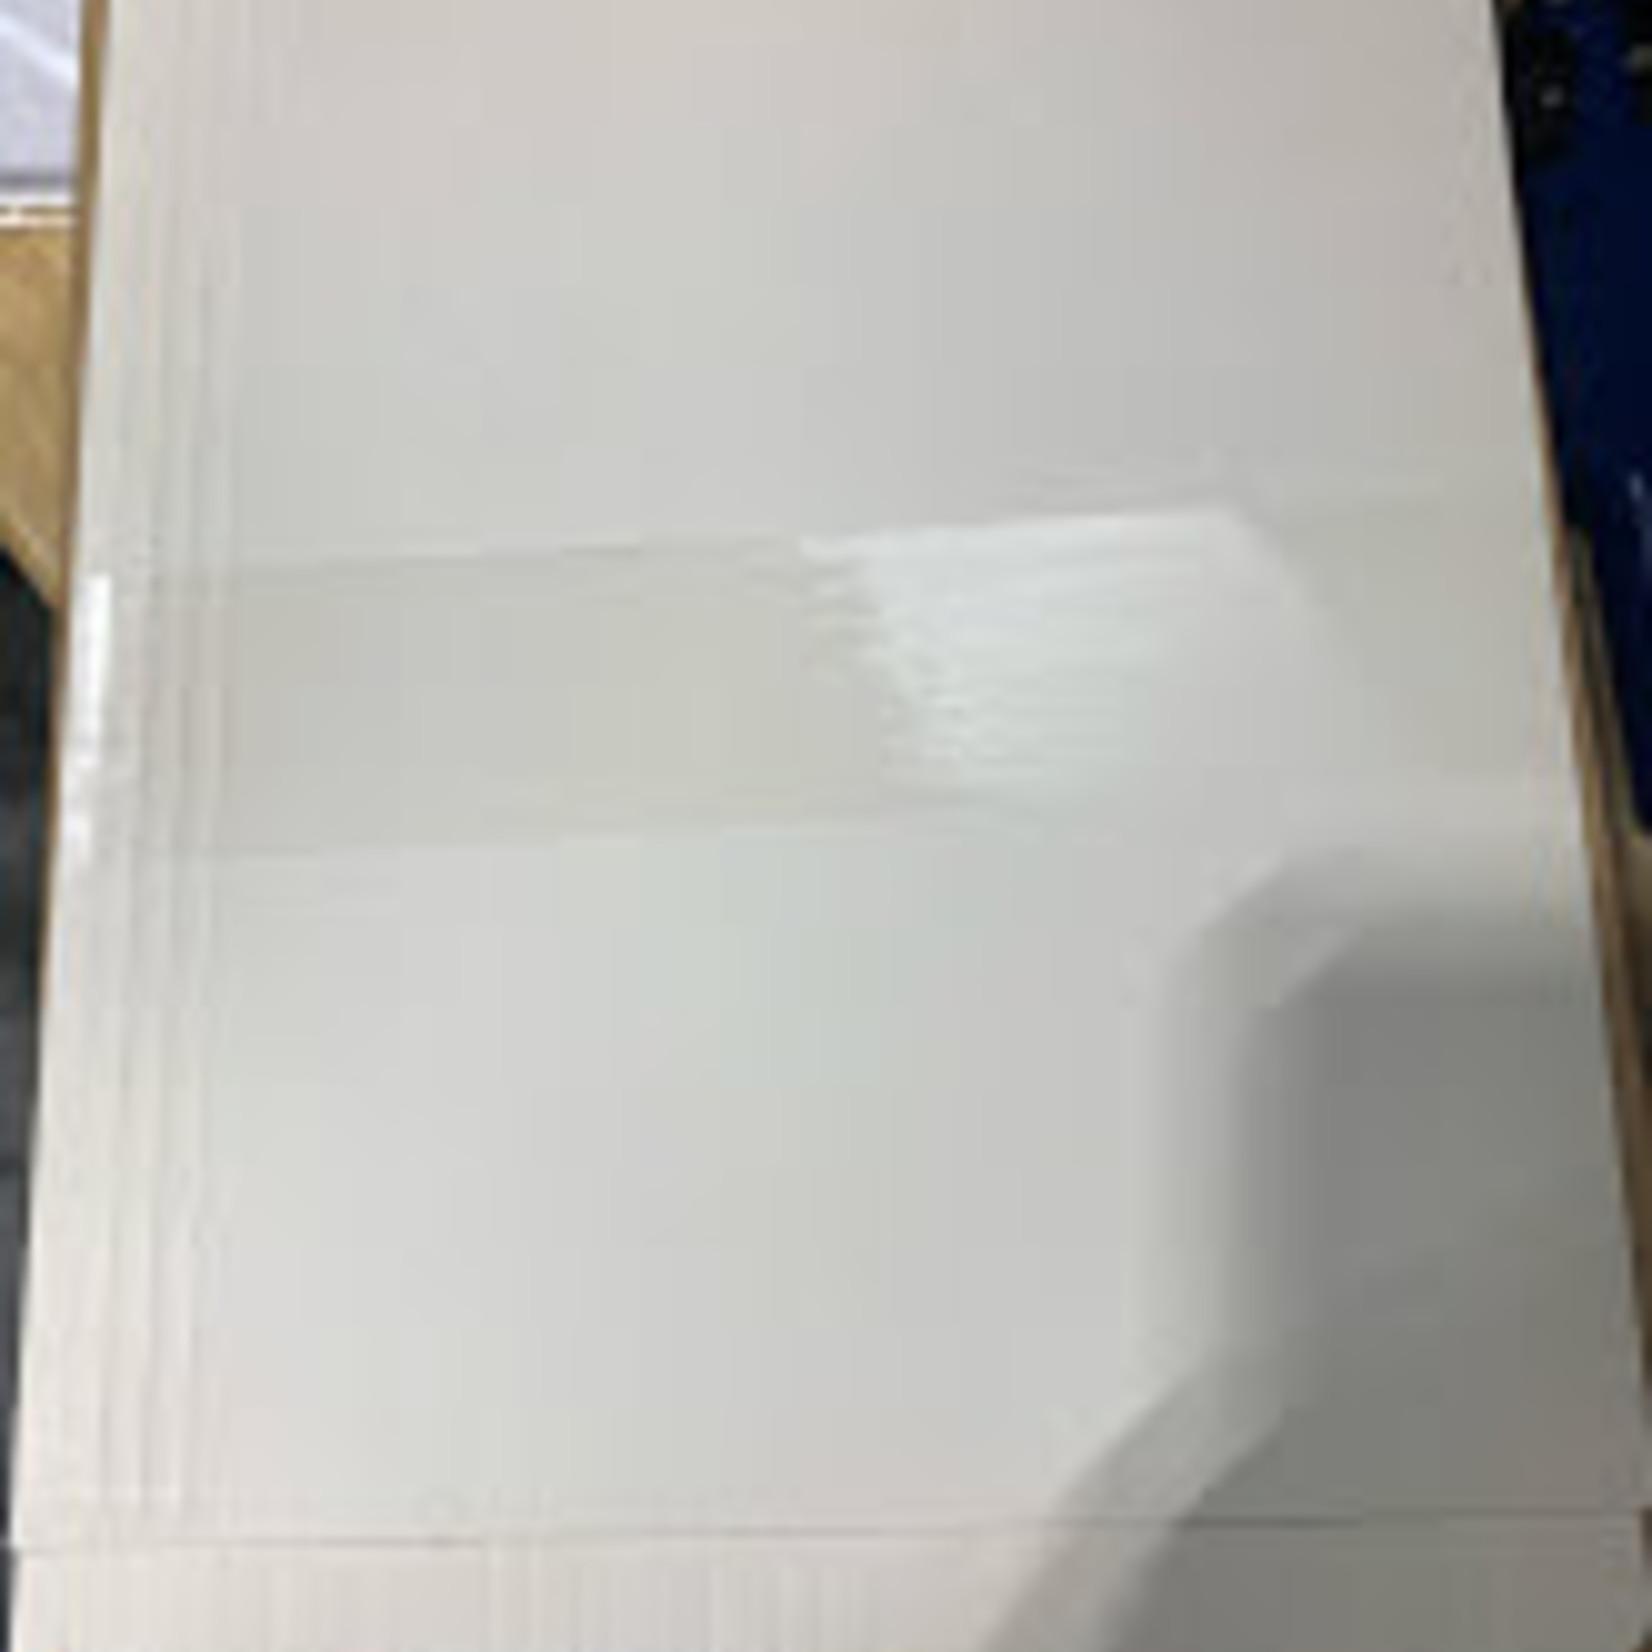 End Tab File Folder 100 /Box